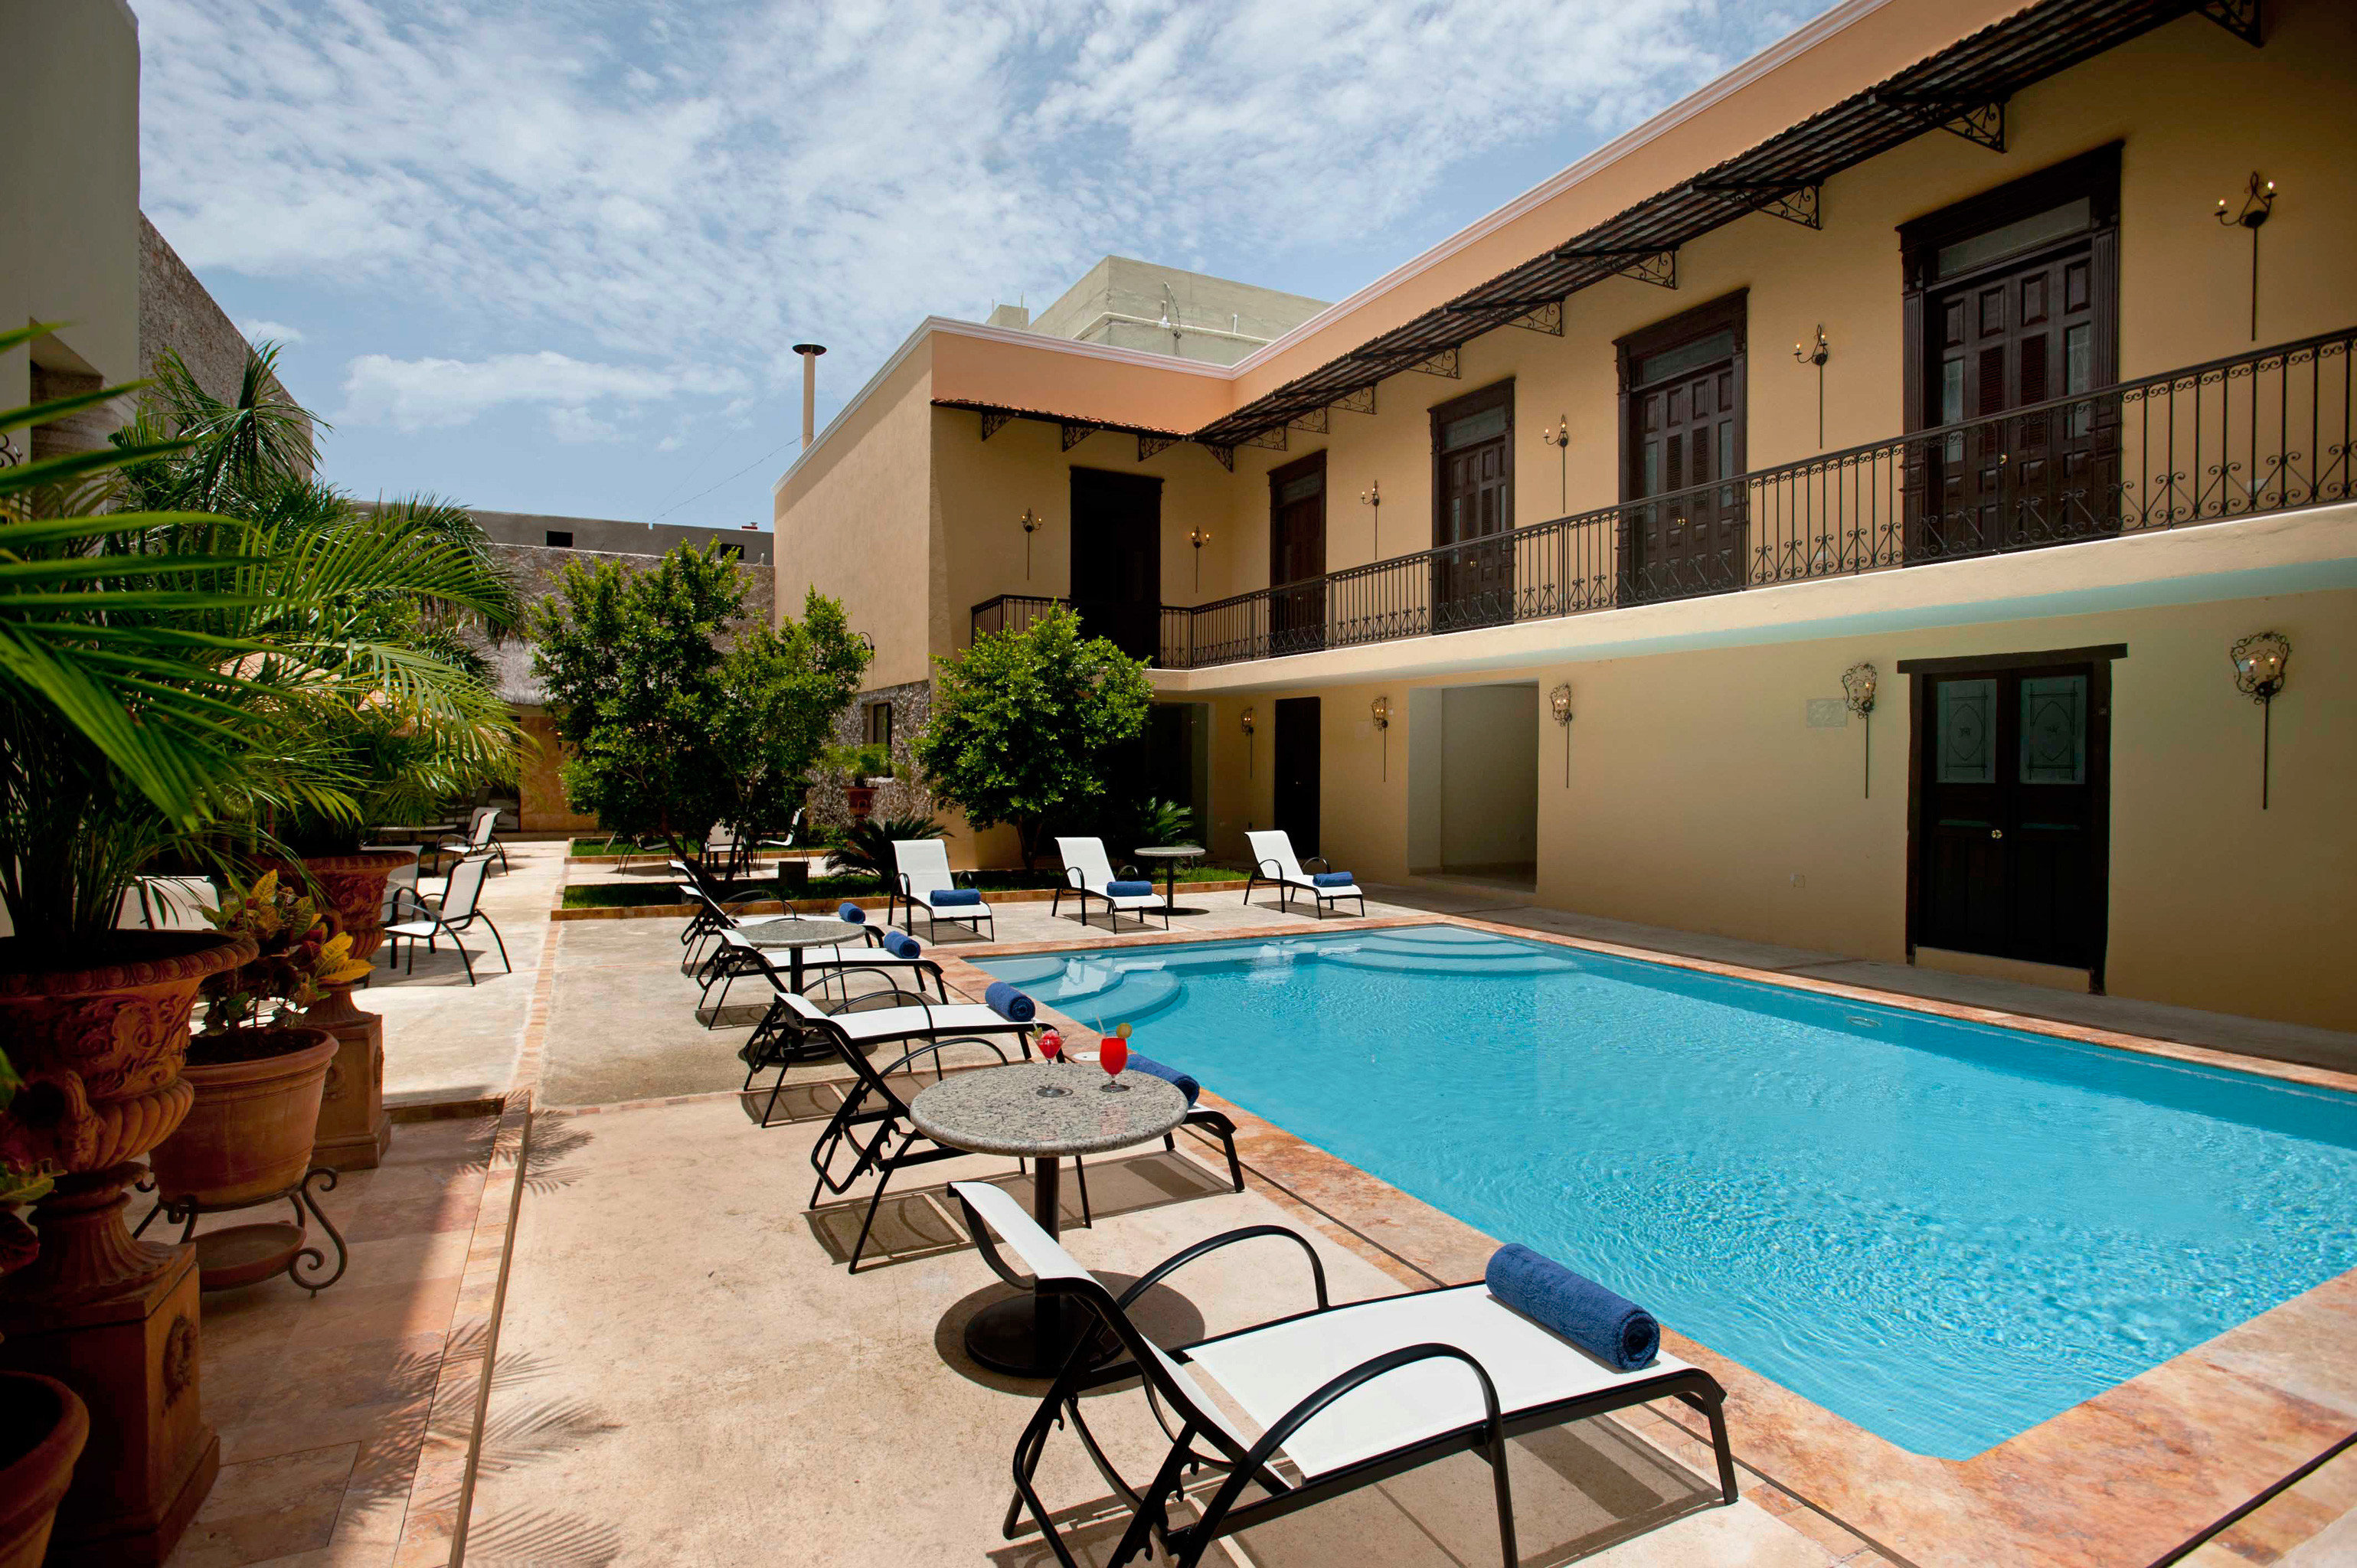 Pool ground building property leisure swimming pool Resort condominium Villa home hacienda